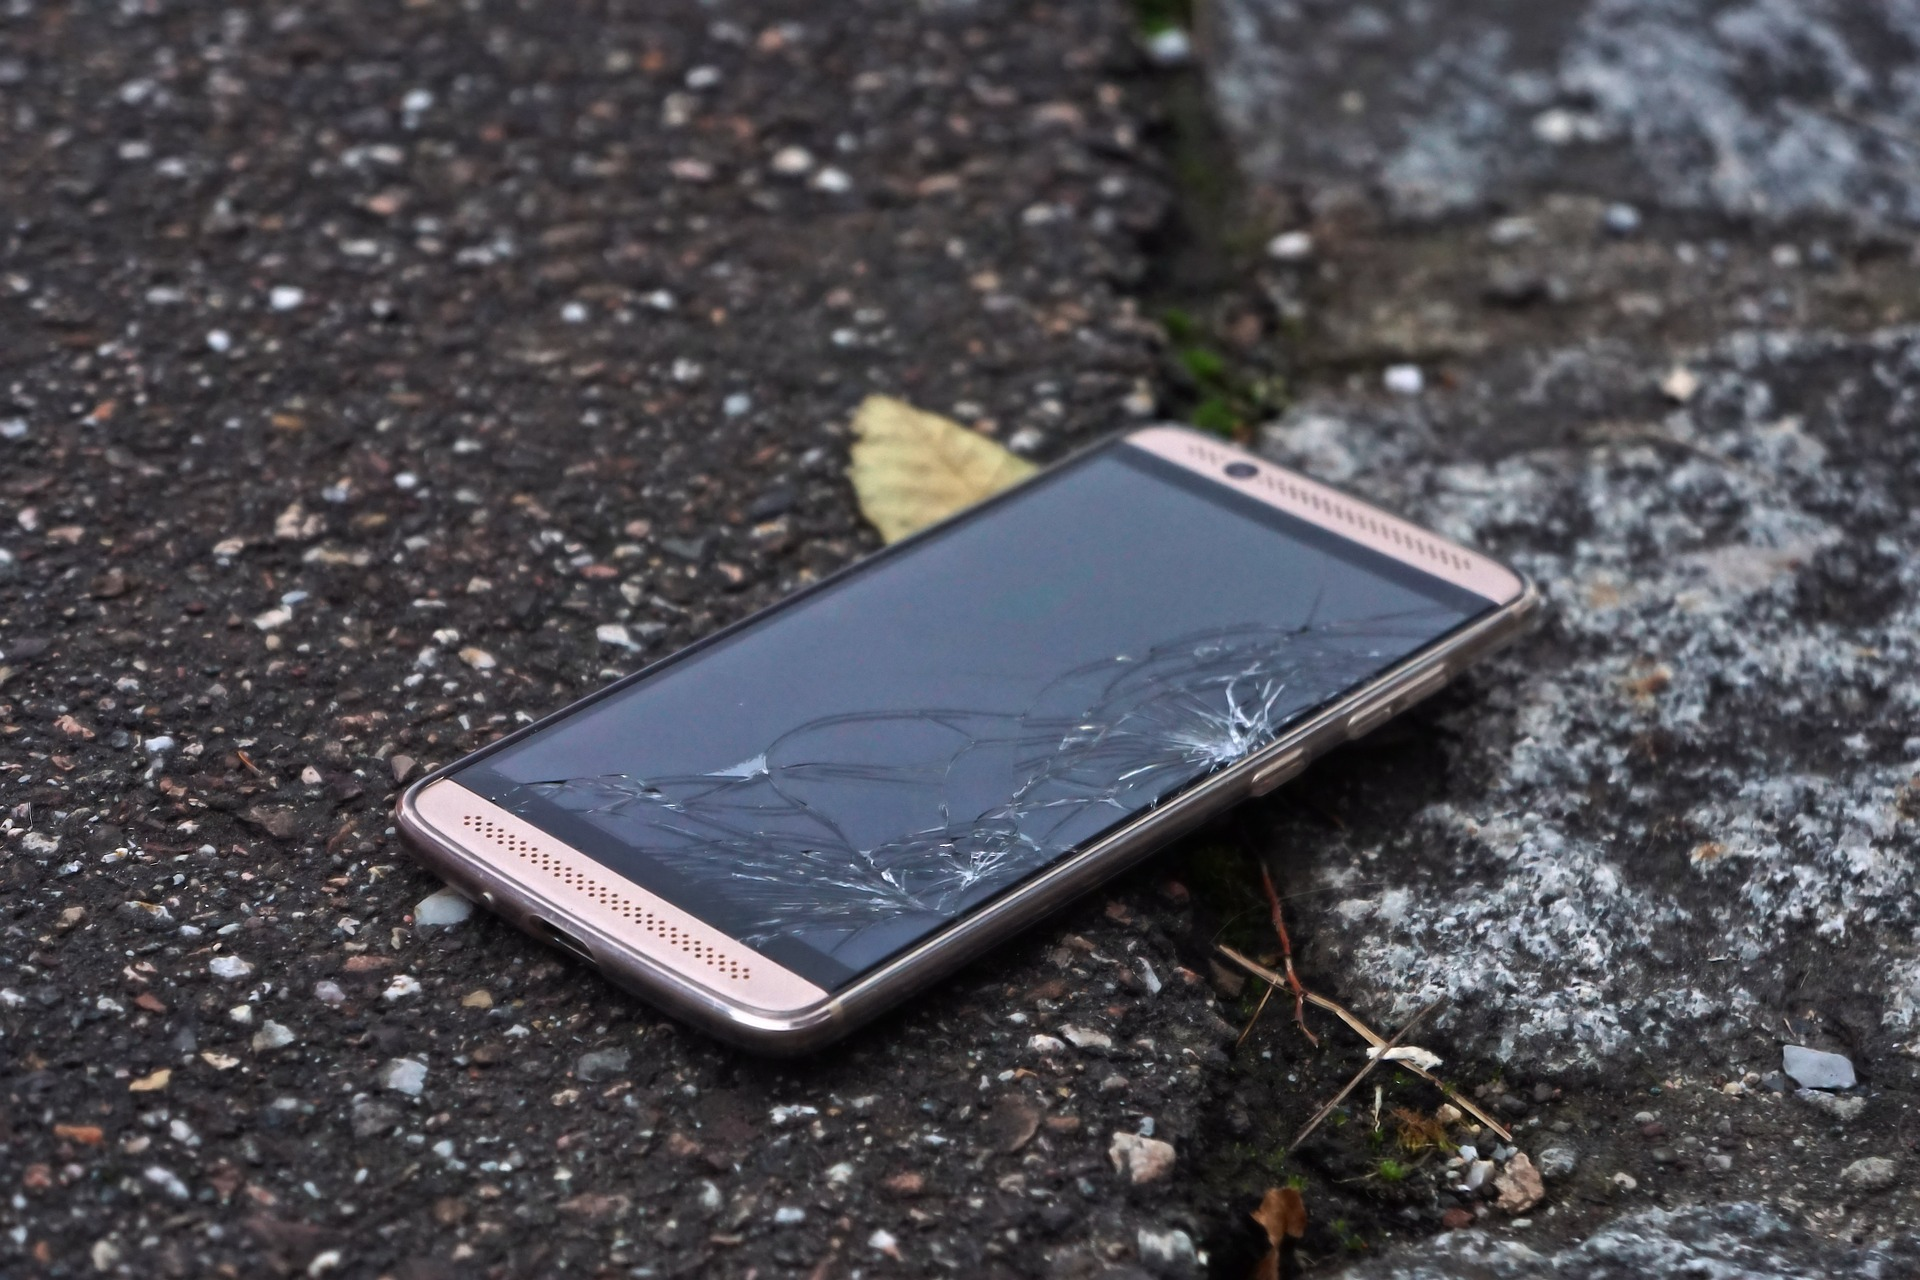 Tablet & smartphone screen repairs in Rugby Warwickshire